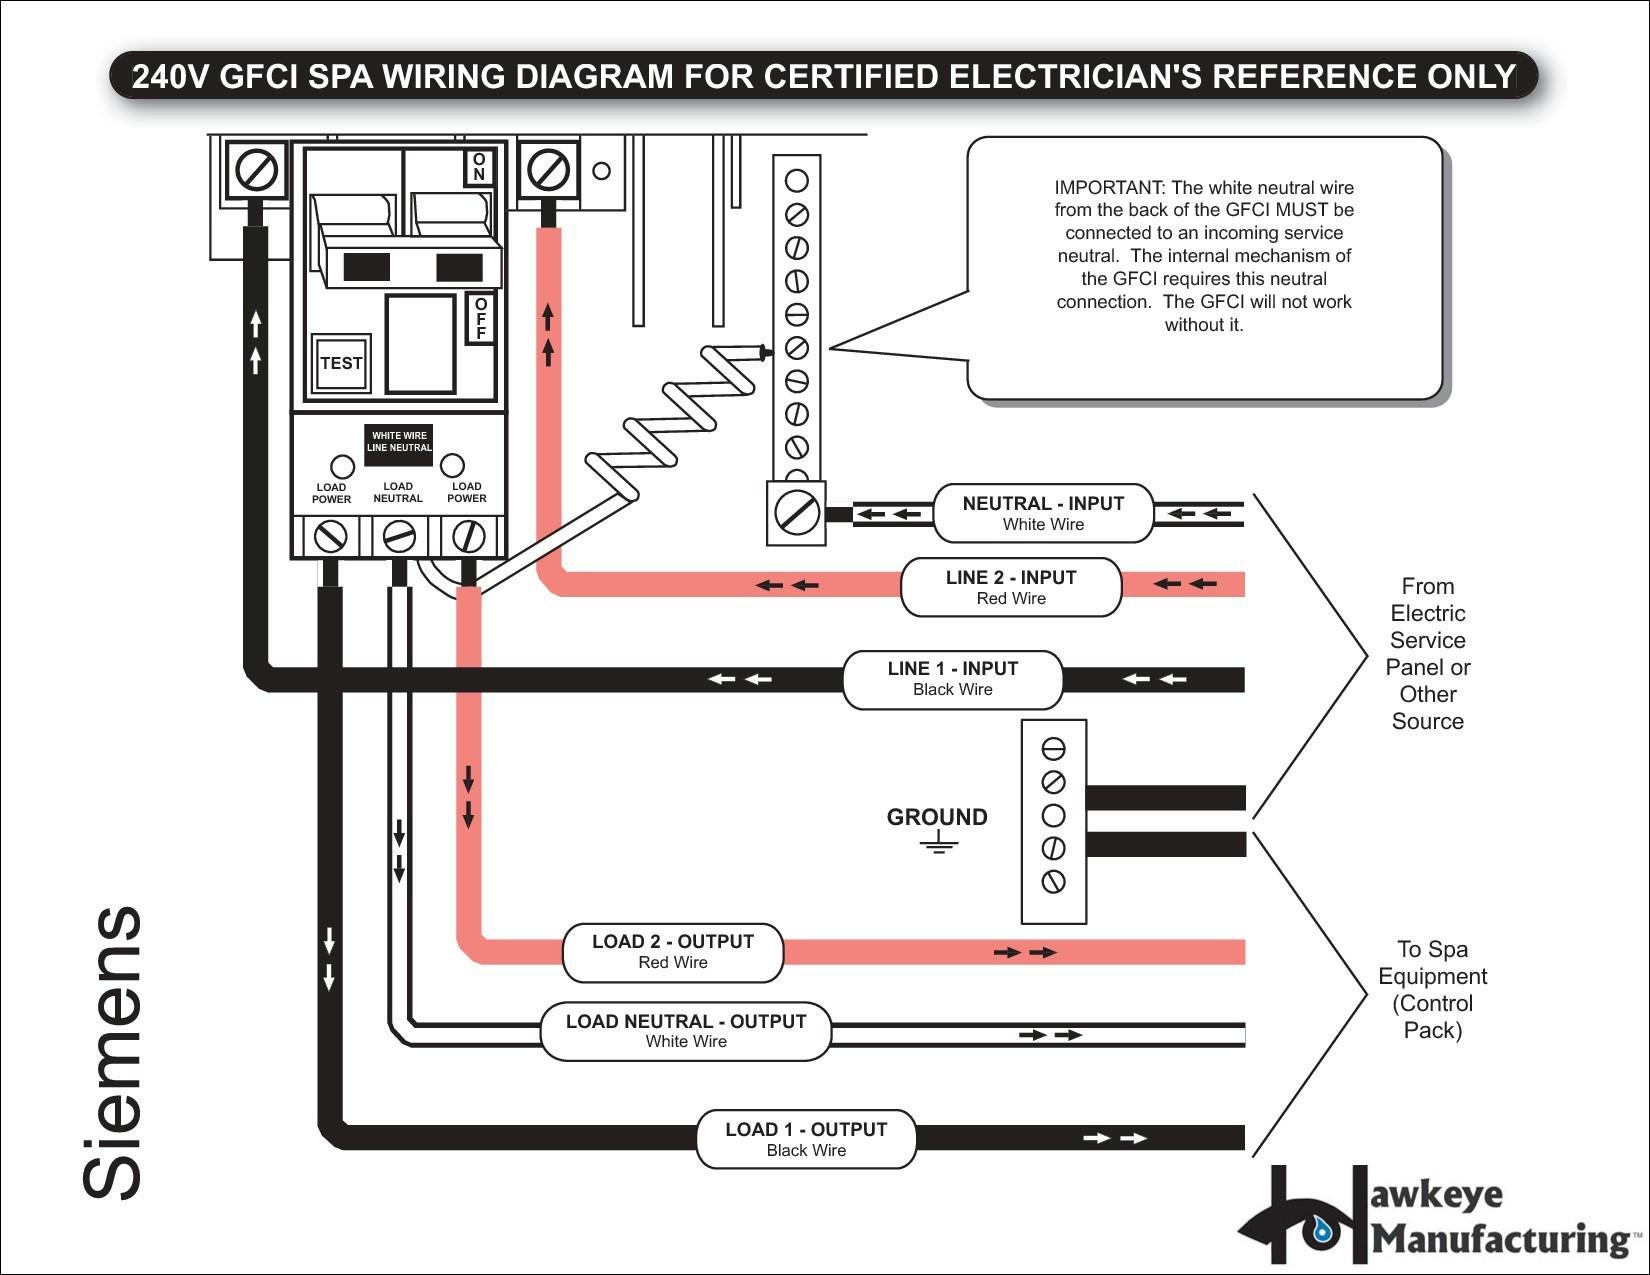 DE_4416] Photo Gallery Of The 2 Pole Gfci Breaker Wiring Diagram Schematic  WiringWned Adit Denli Lous Heeve Mohammedshrine Librar Wiring 101